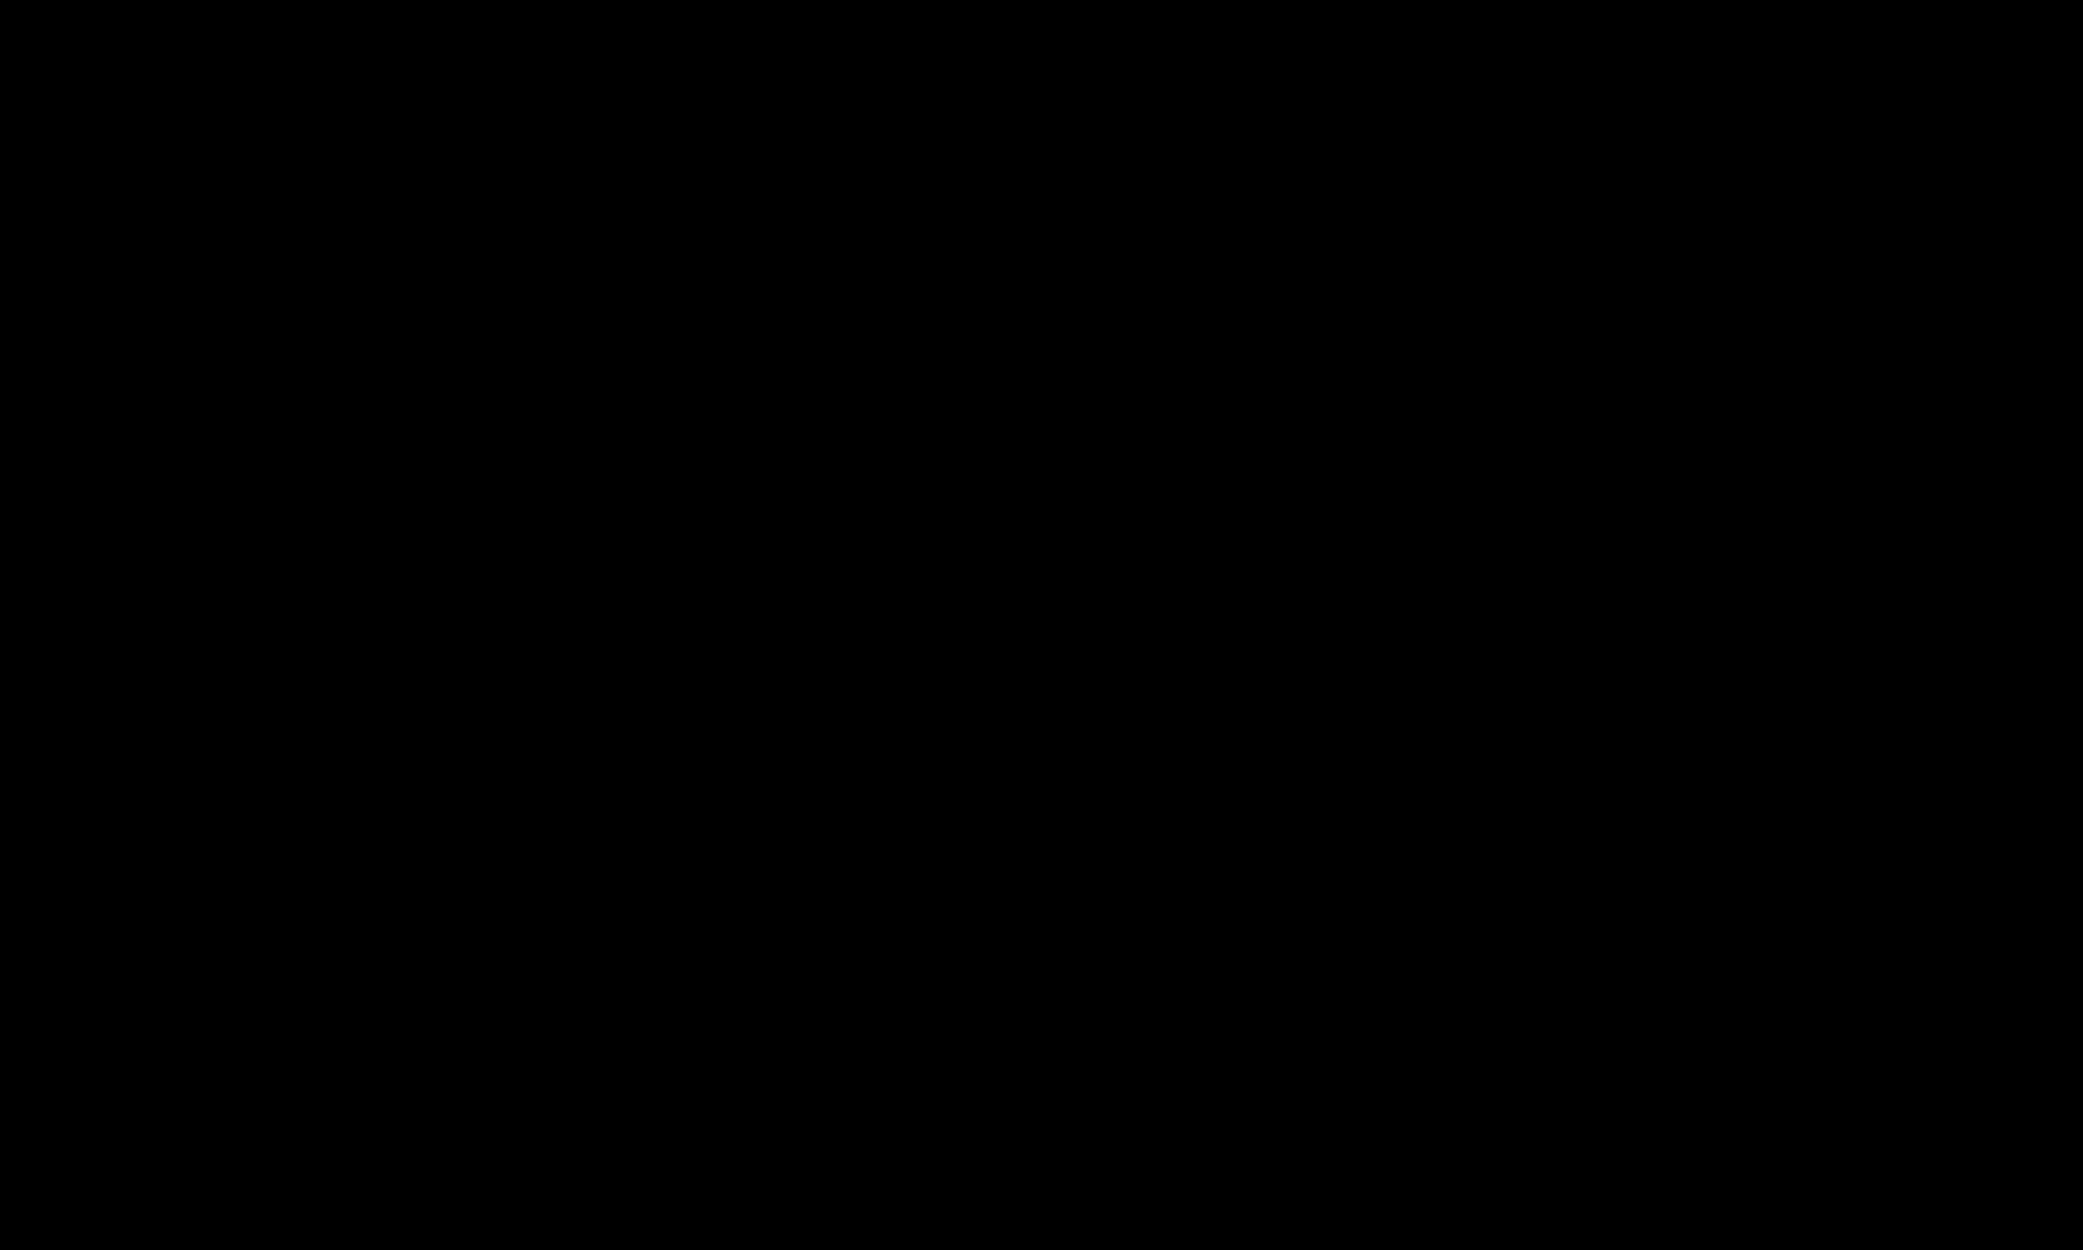 DanKam_Client-CompanyLogos-19.png